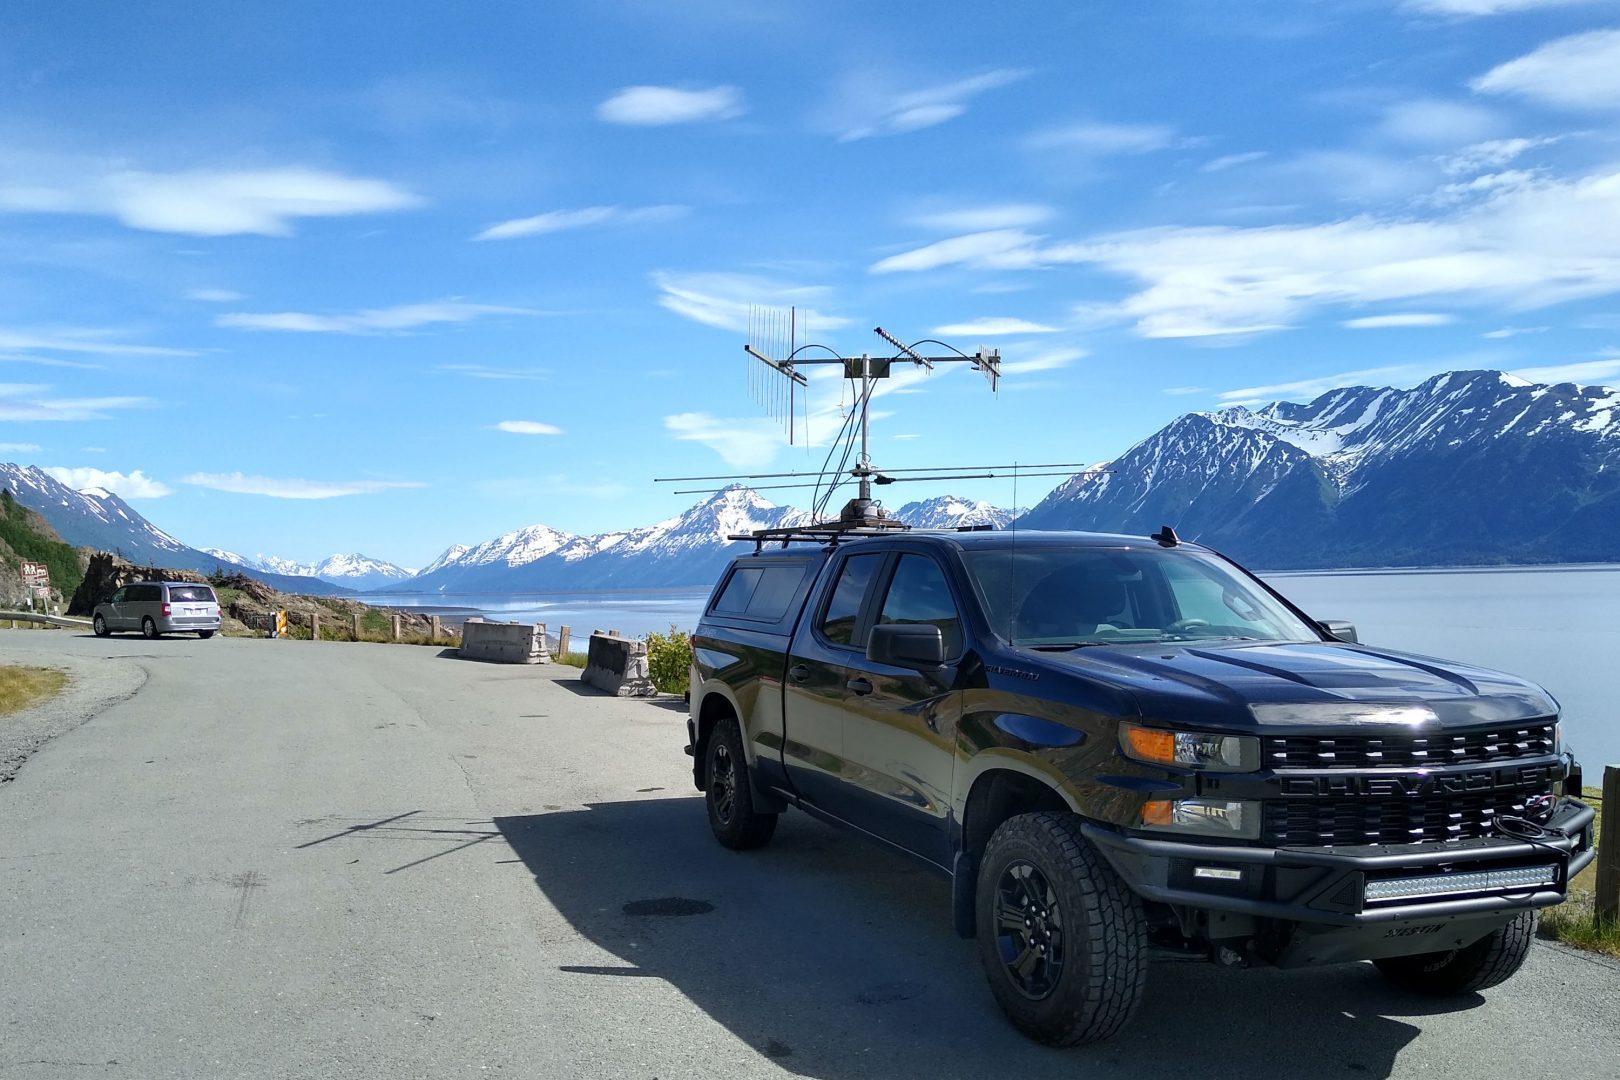 Ham radio rover in Turnagain Arm, Alaska